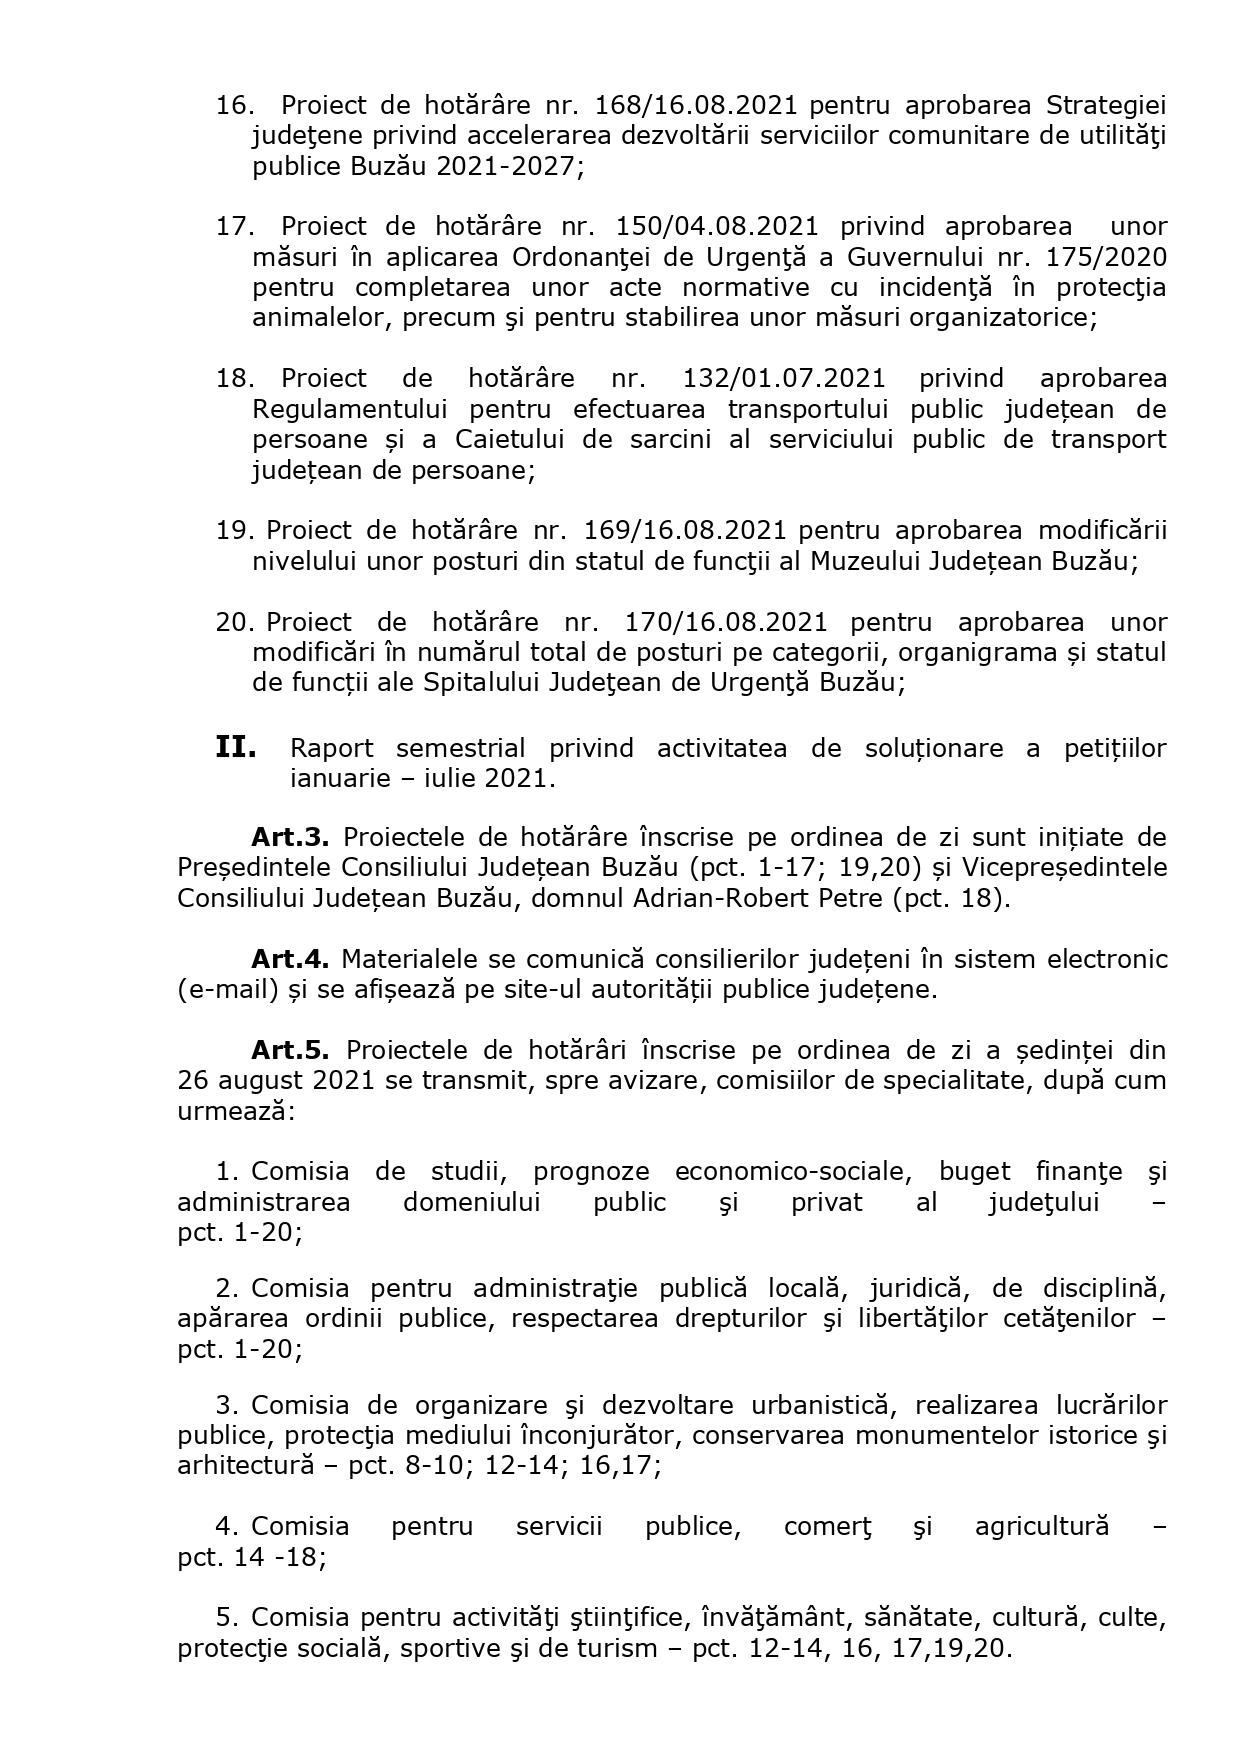 Disp. conv. 26 aug. 2021 page 0003